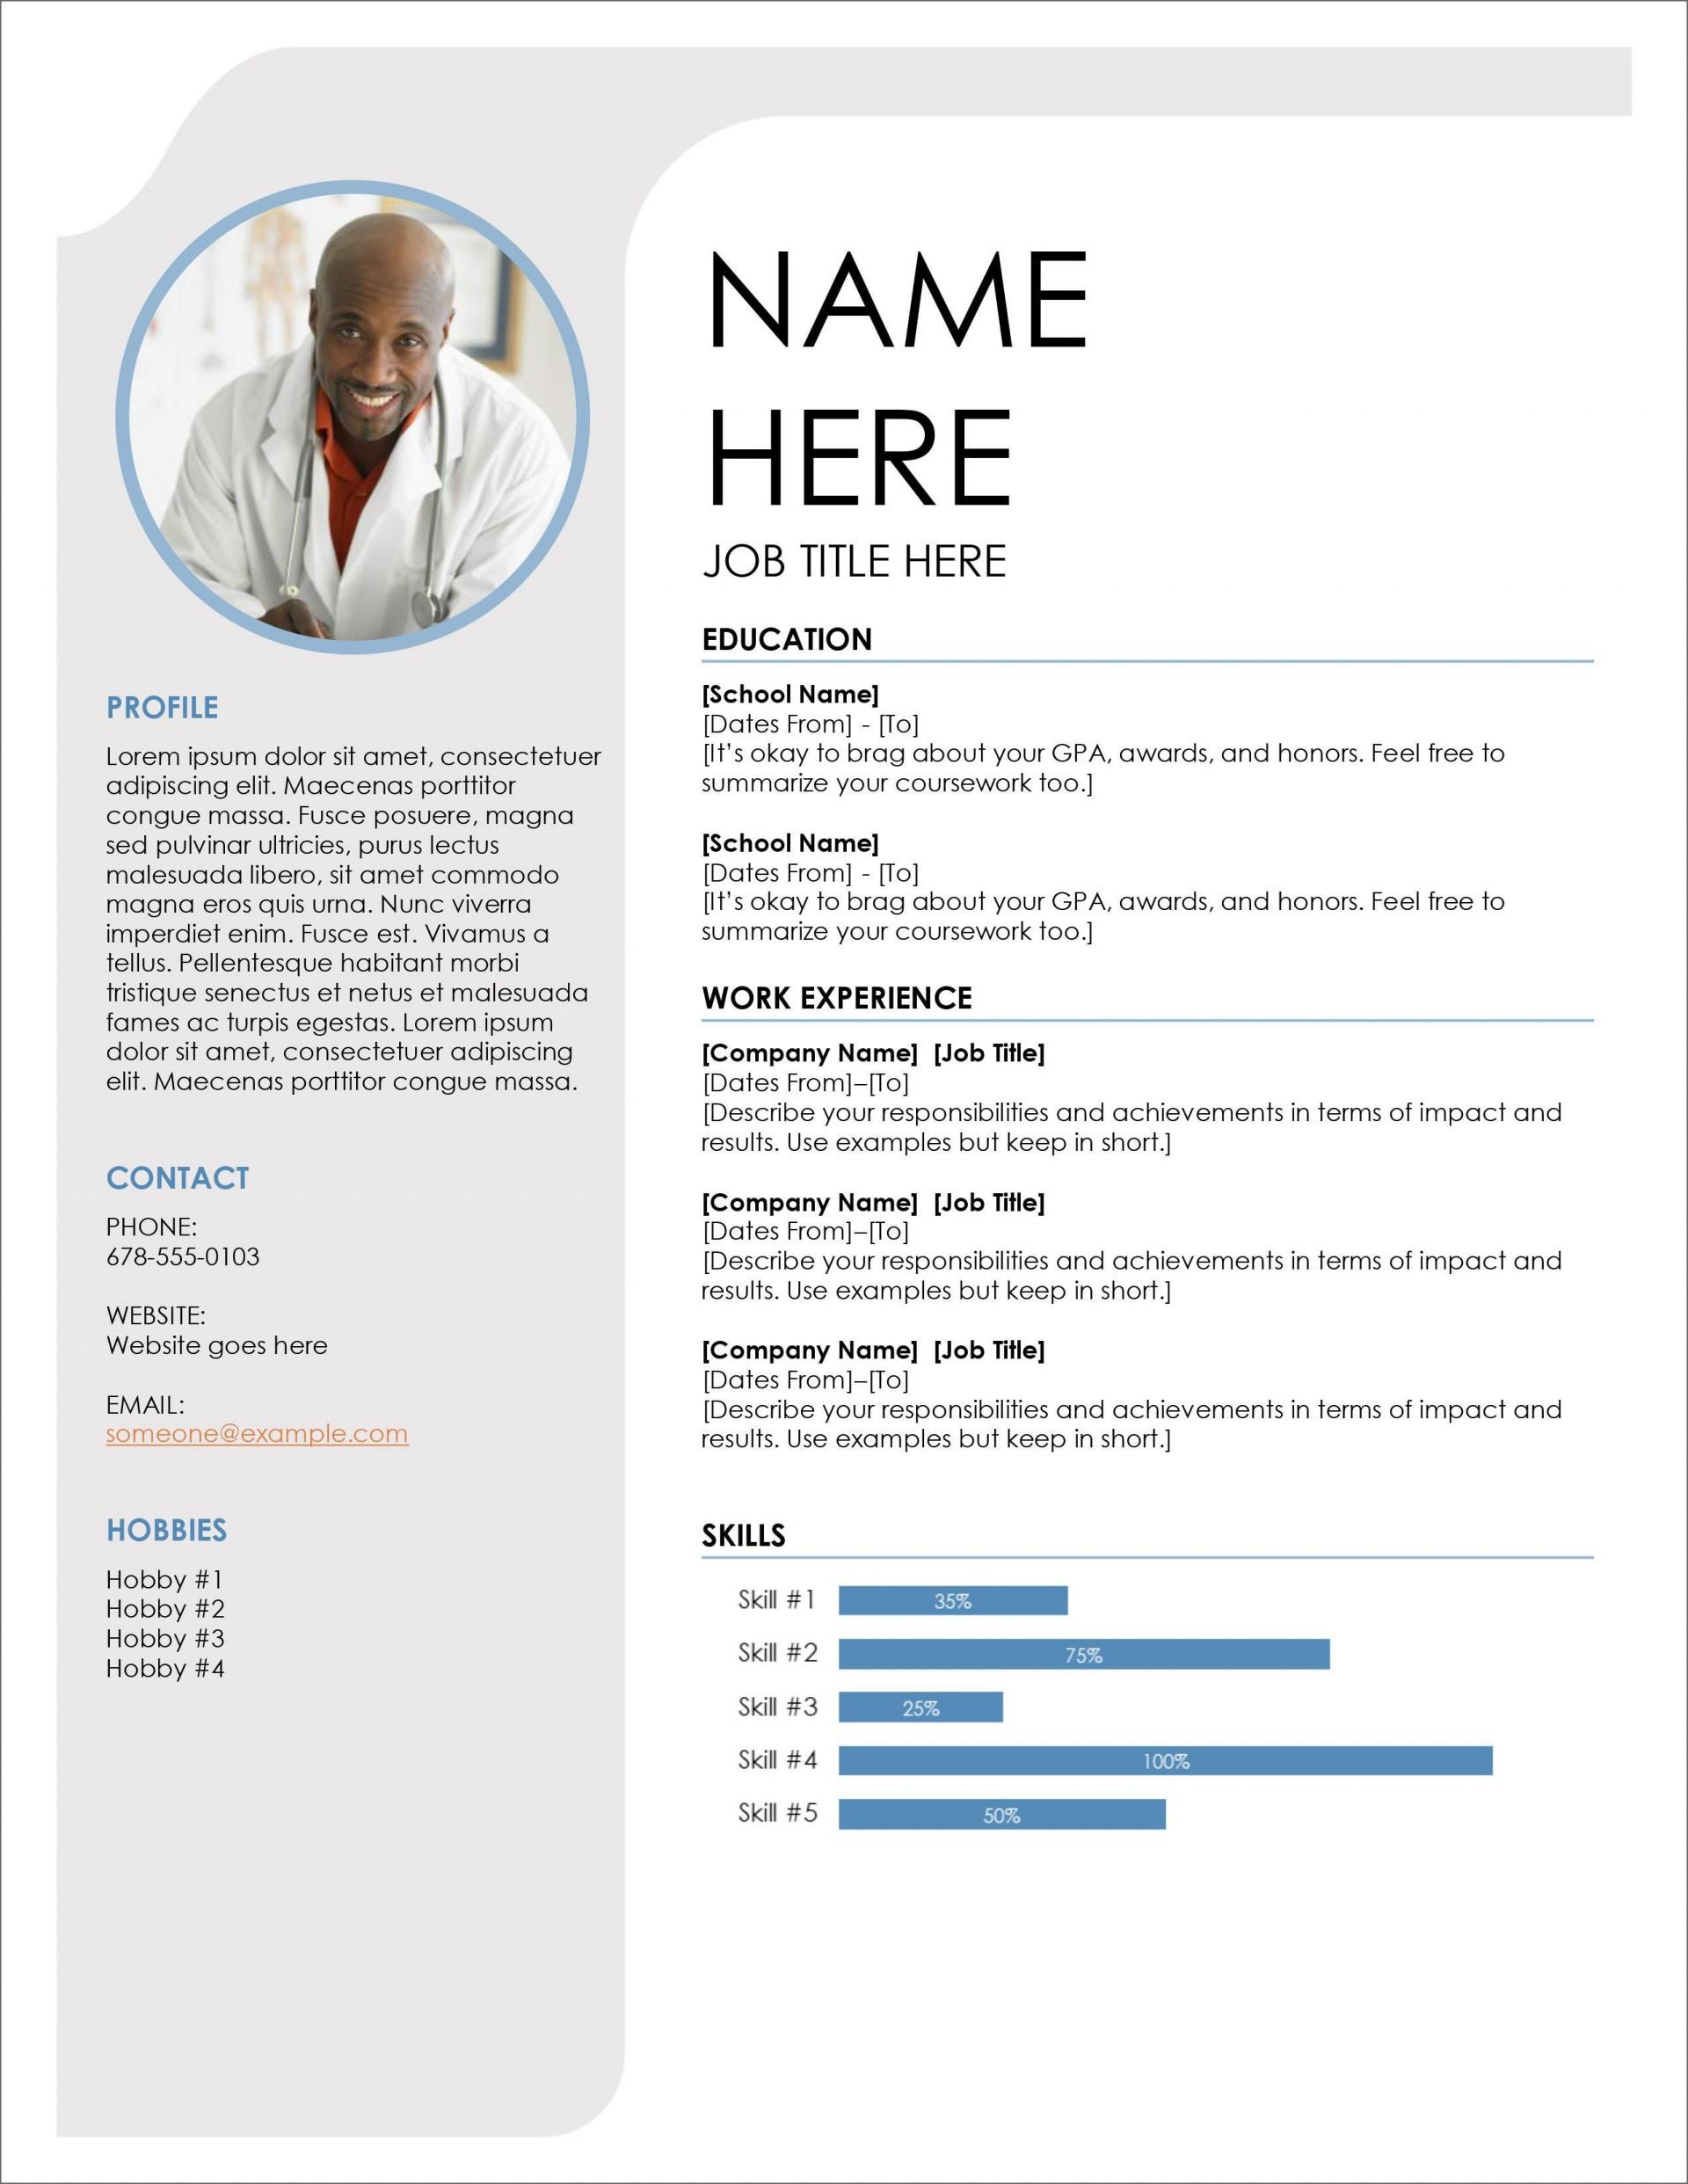 010 Stupendou Download Resume Template Free Word Design  Attractive Microsoft Simple For Creative1920